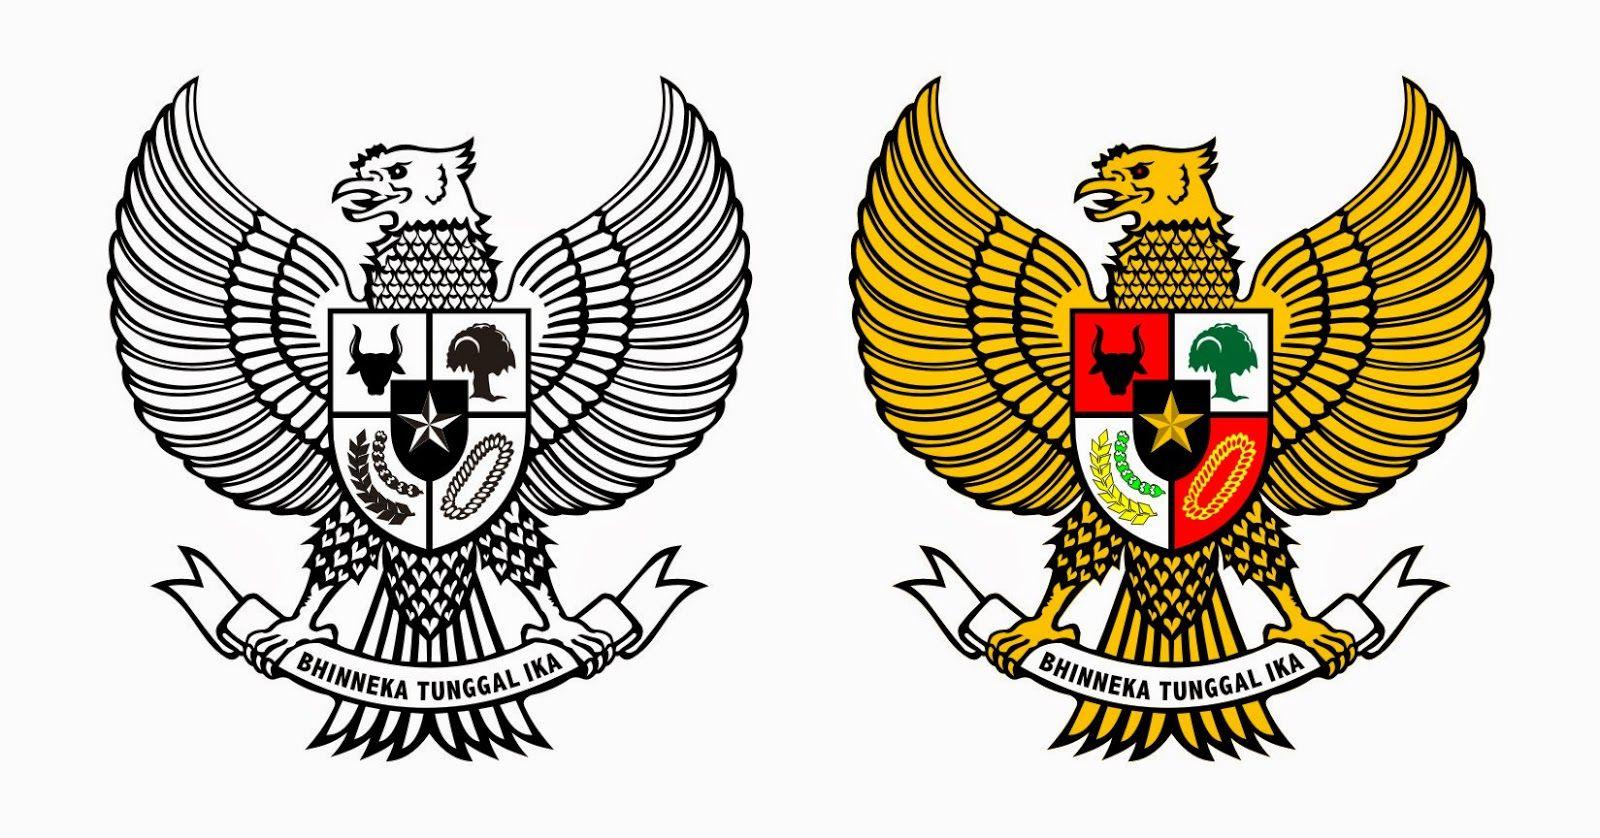 Garuda Pancasila Dengan Gambar Lambang Negara Seni Animasi Seni